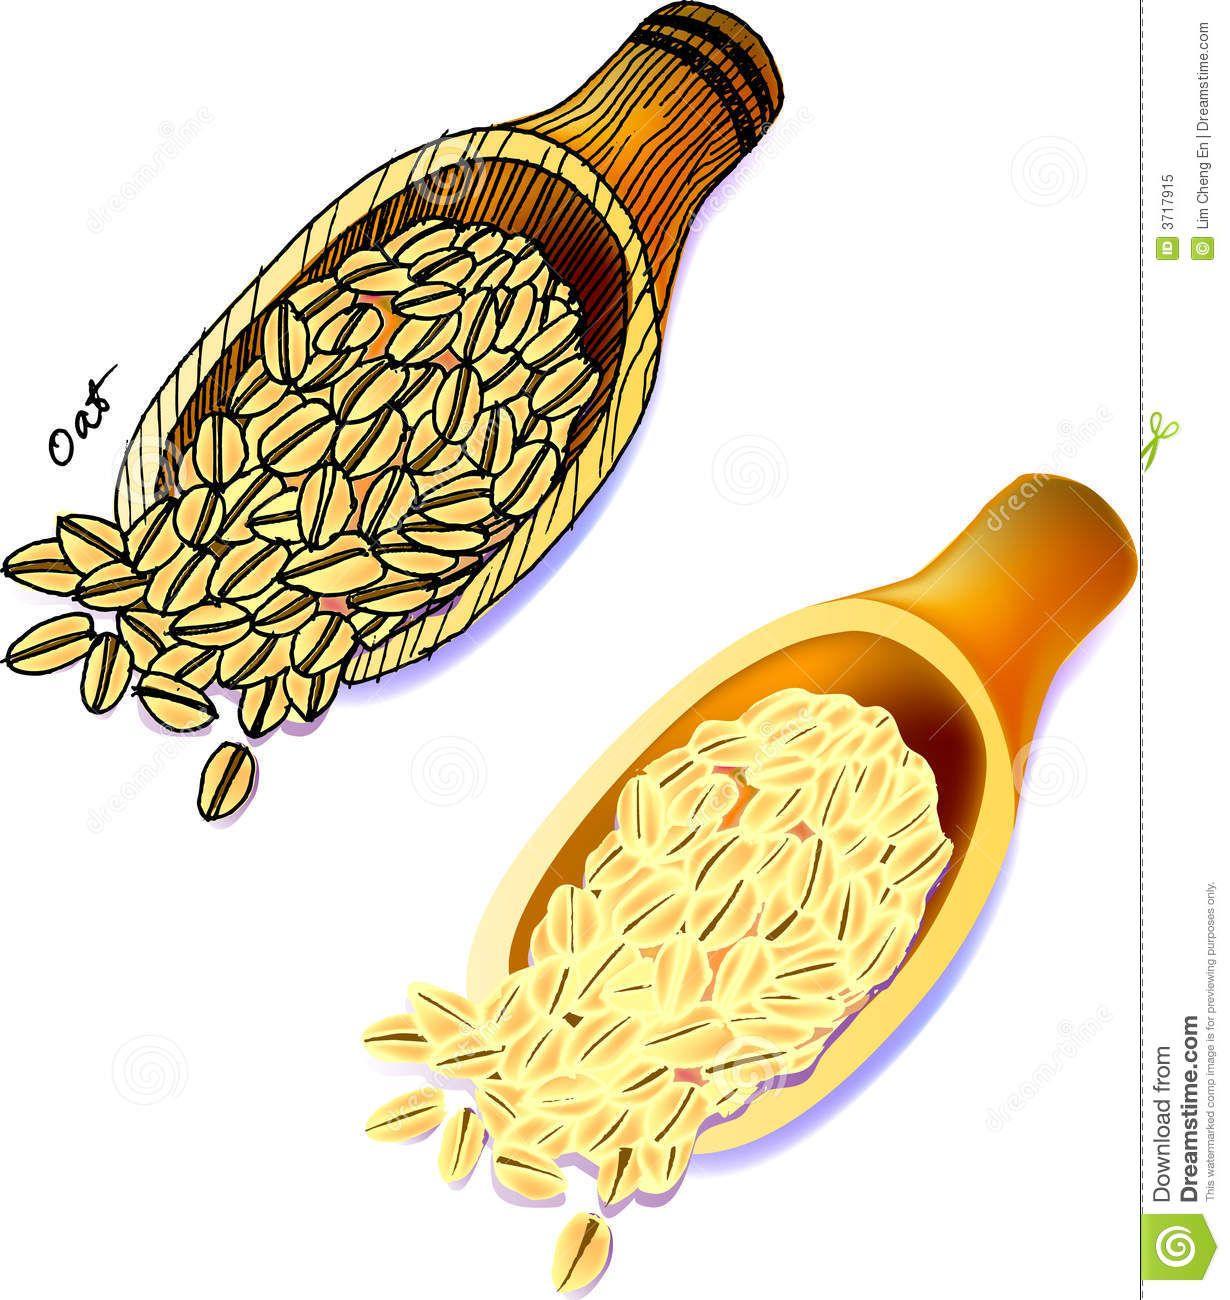 Free download best . Grain clipart oats